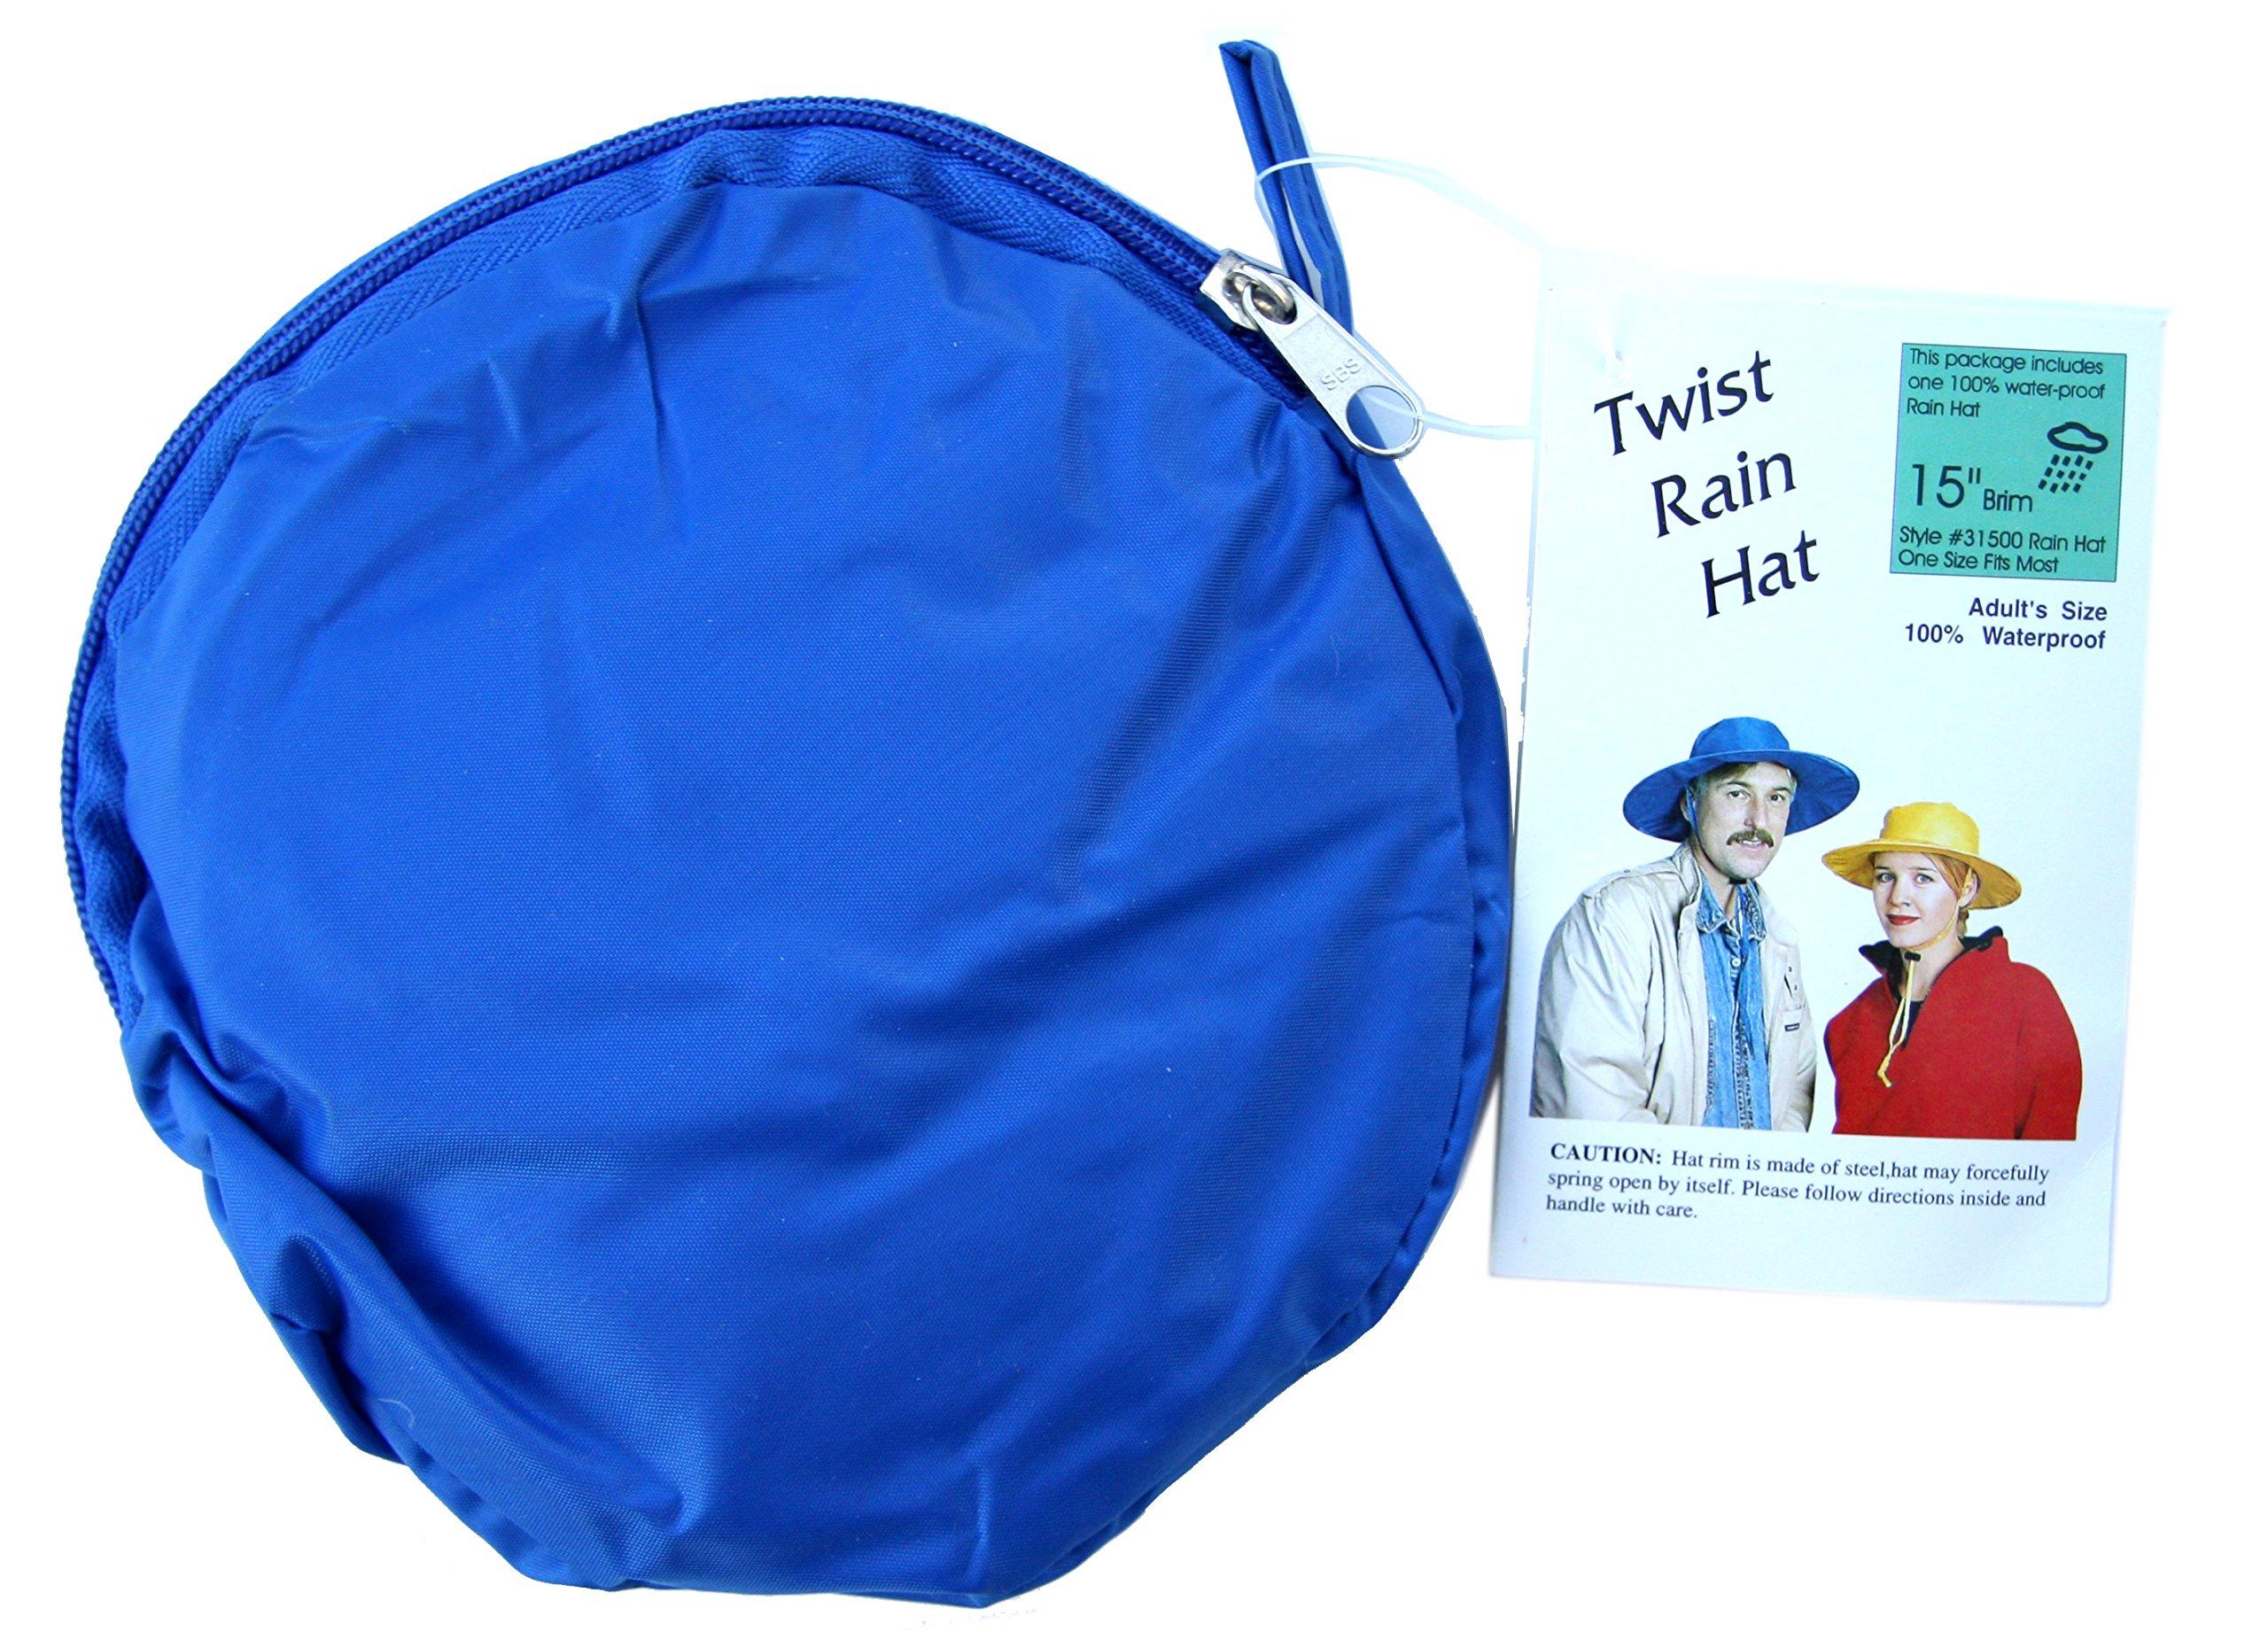 Twist-and-Fold Rain Hat, (Royal Blue)